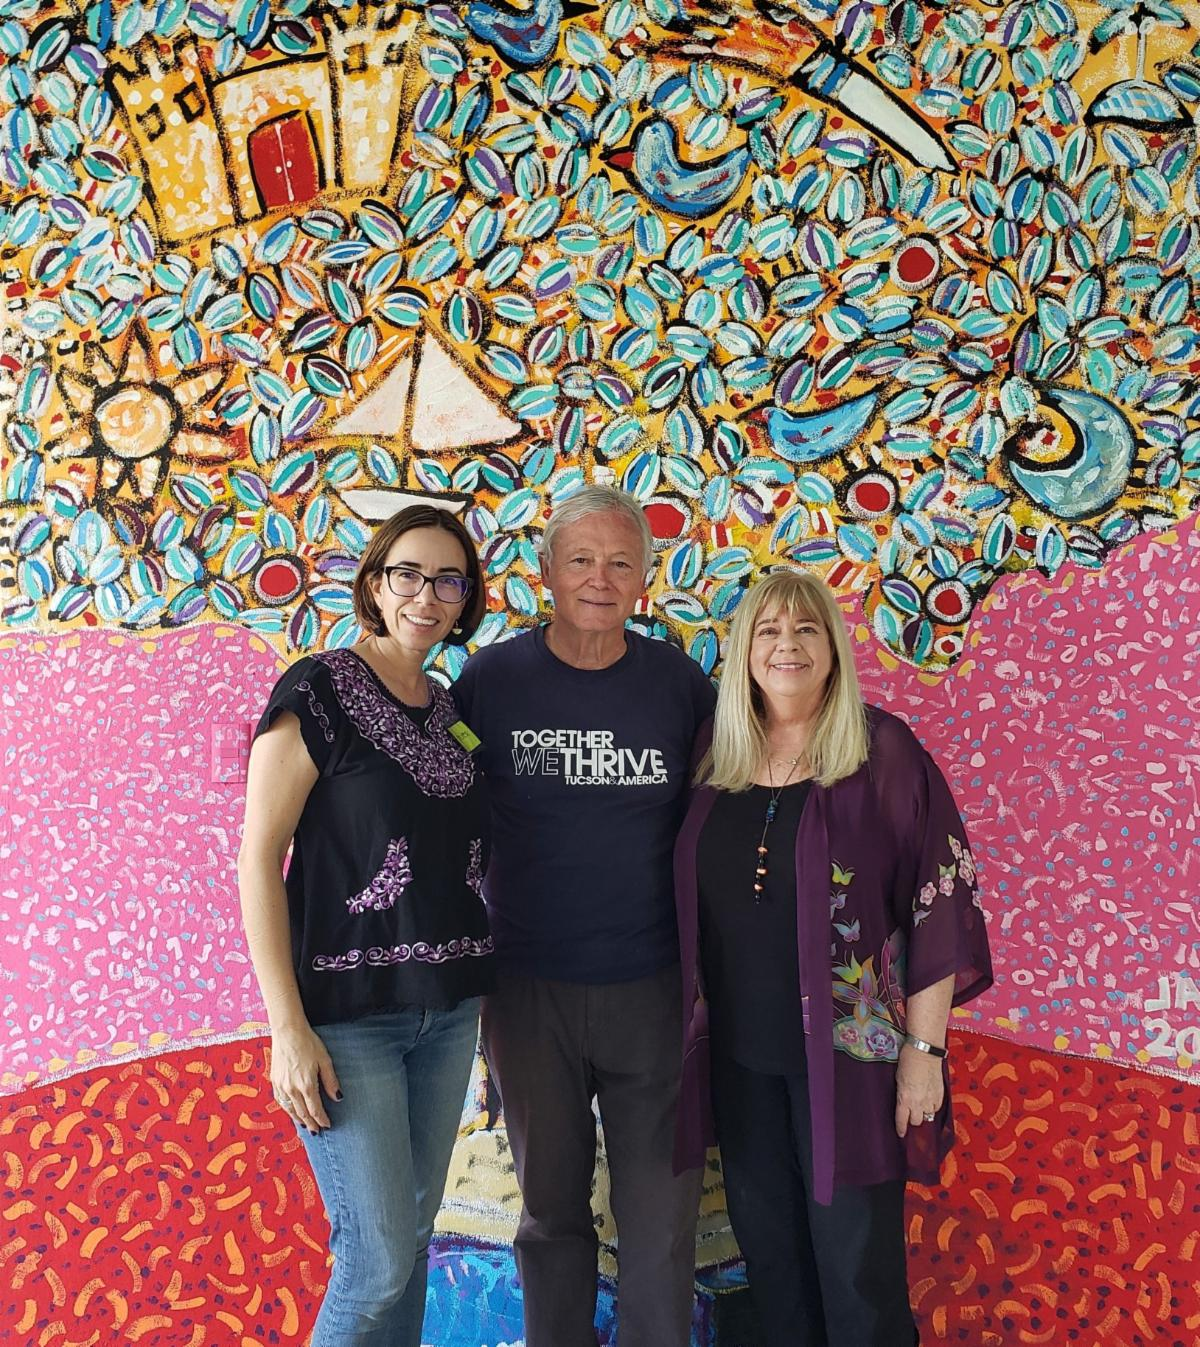 Andrea Garcia Todd Fletcher and Kathy Short at Resplandor